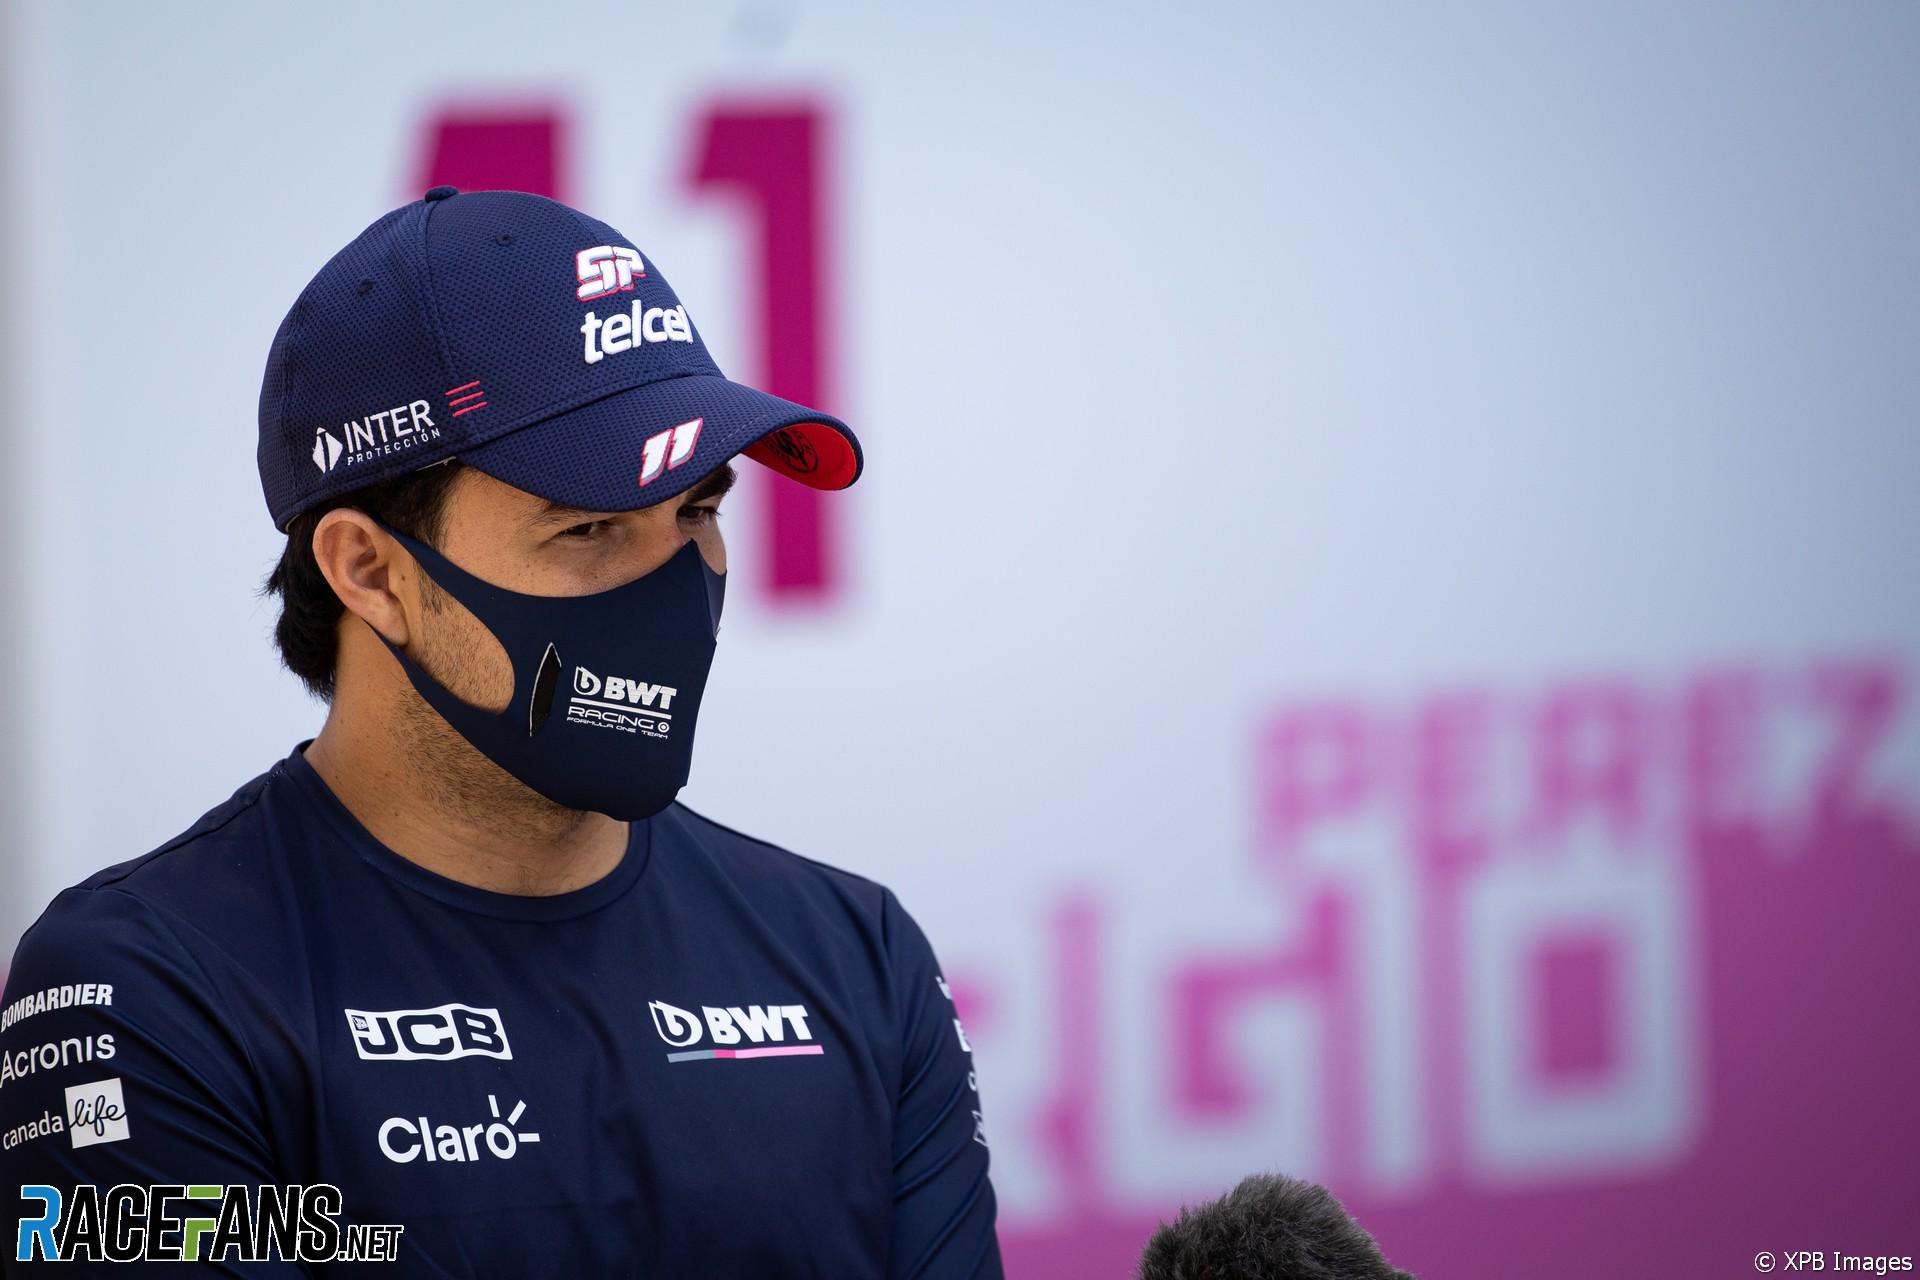 Sergio Perez, Racing Point, Sochi Autodrom, 2020